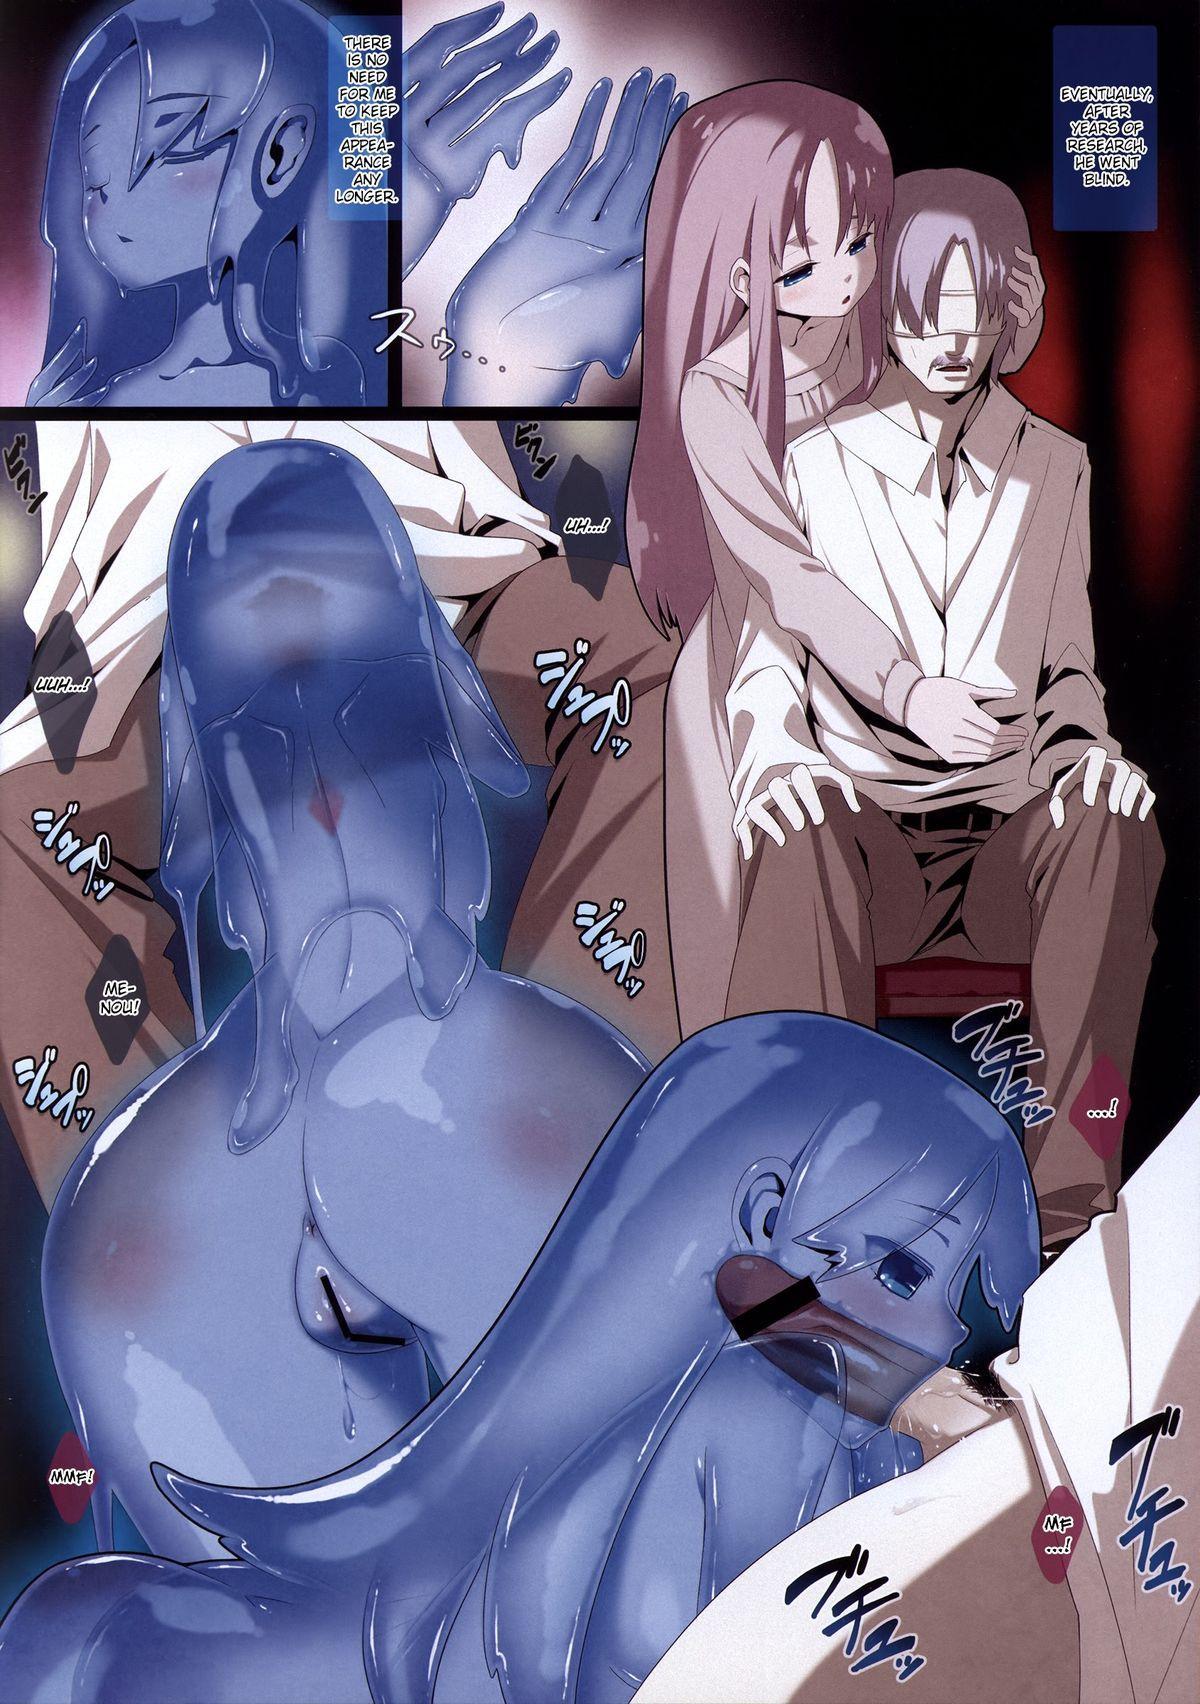 Ajin Shoujo Tan Vol. 4 15